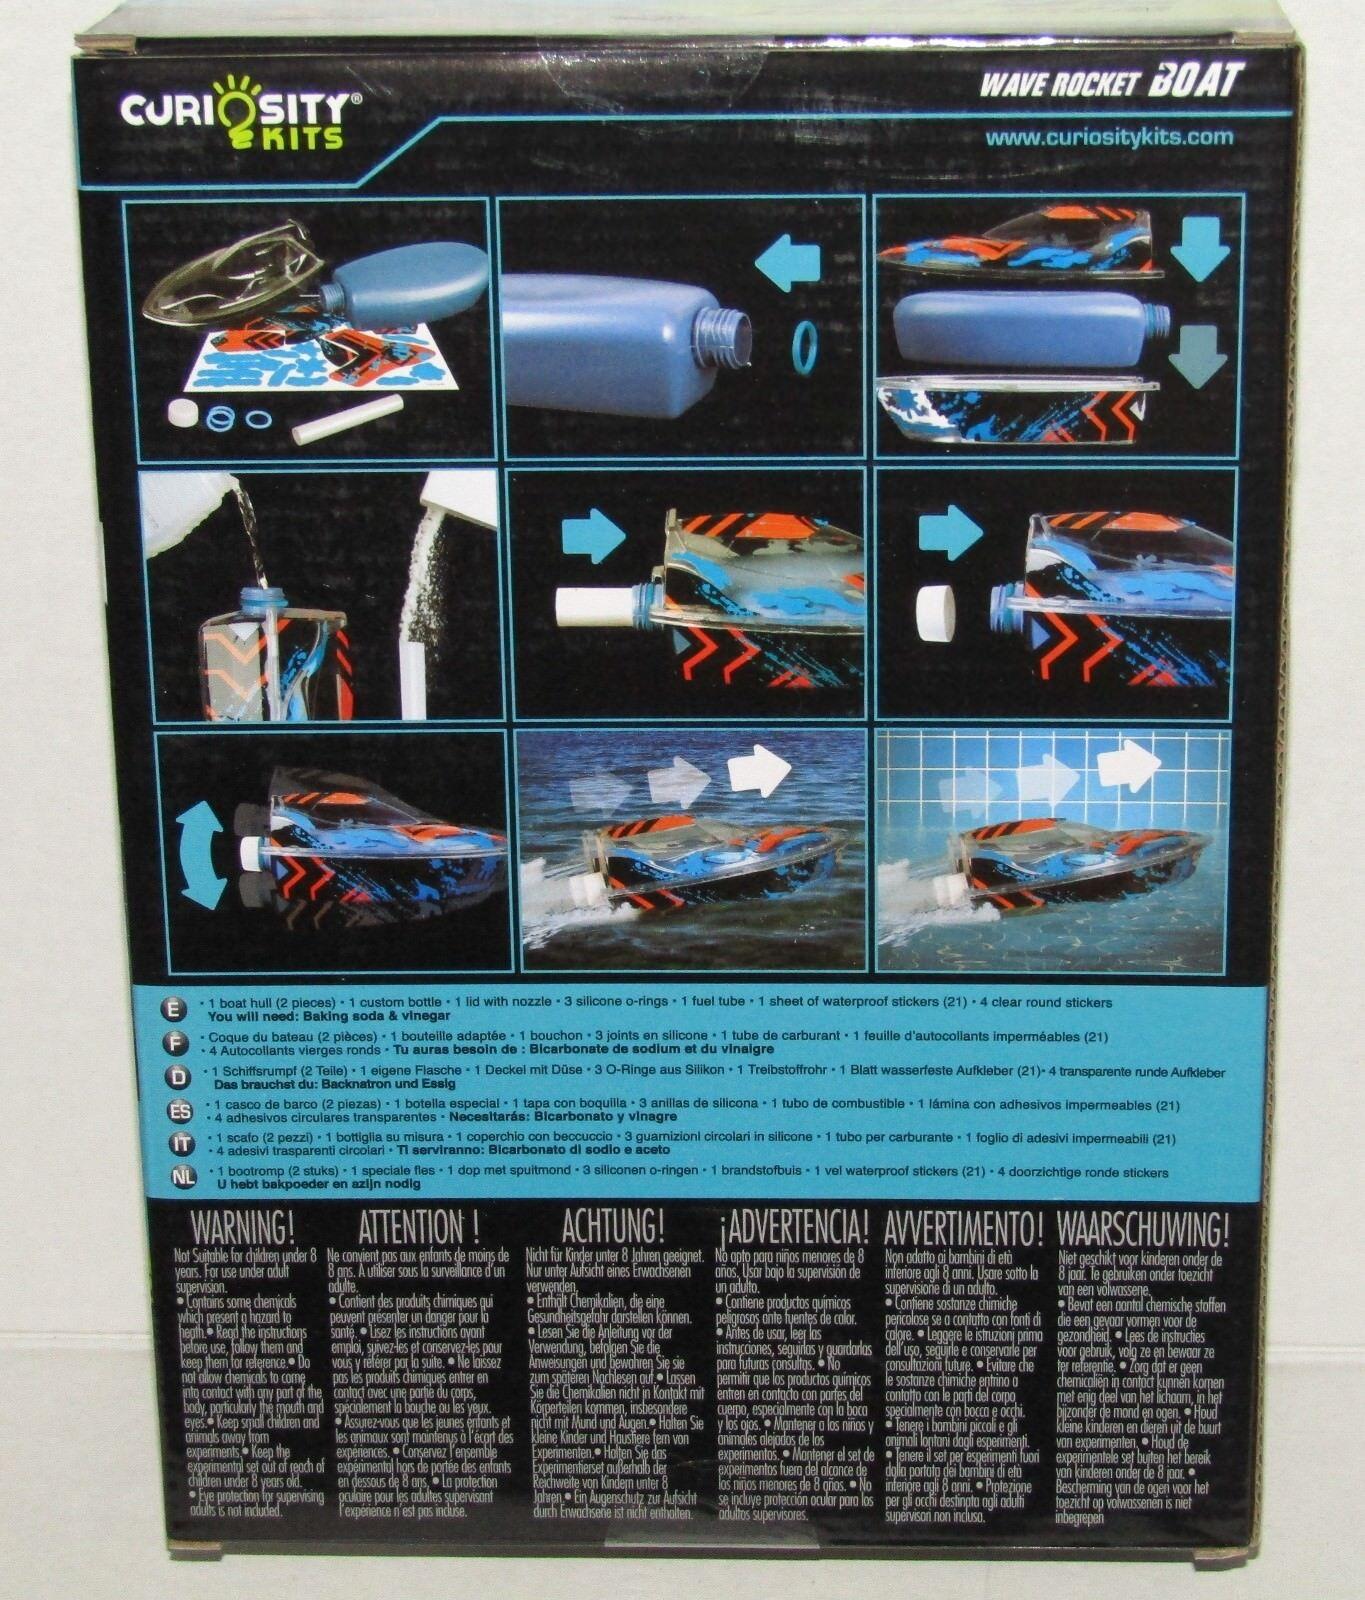 Orb Factory 72131 Wave Rocket Boat Curiosity Kits